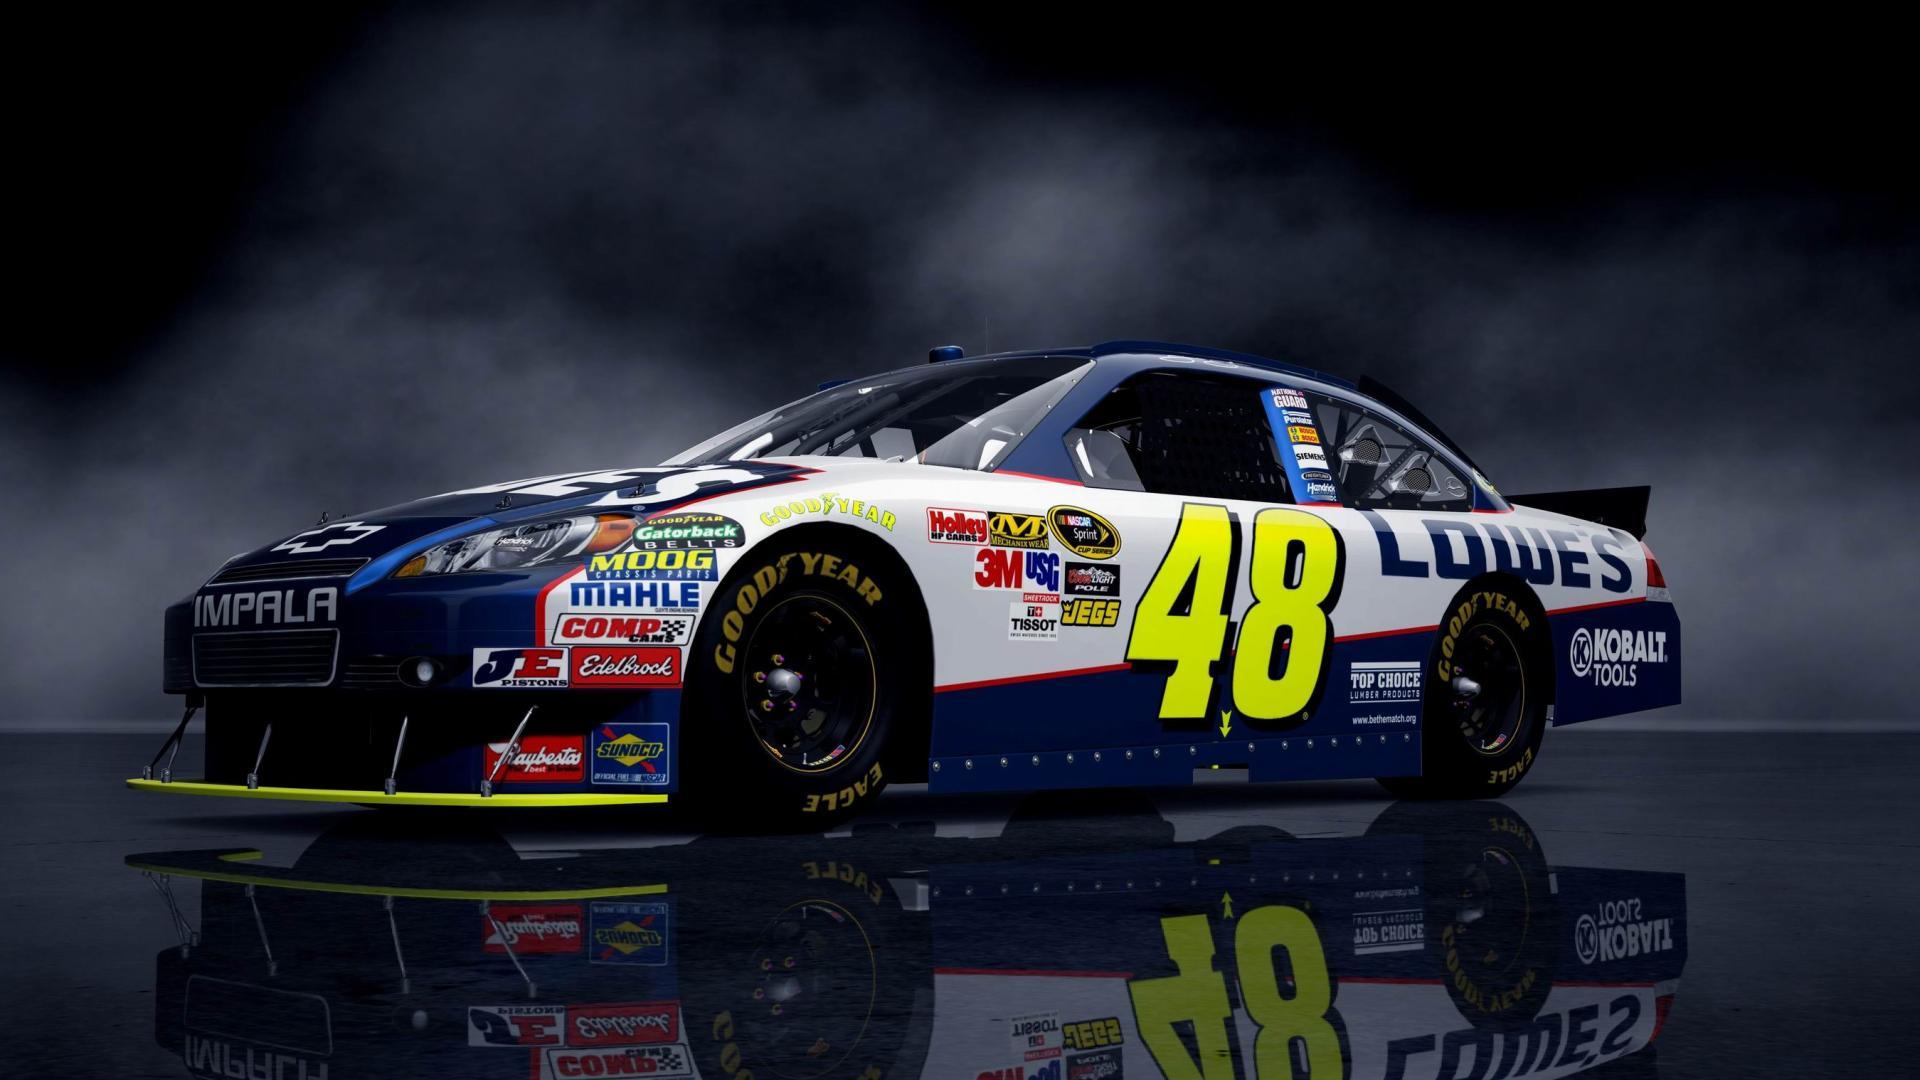 Free Nascar Wallpapers For Desktop: [50+] NASCAR HD Wallpapers On WallpaperSafari